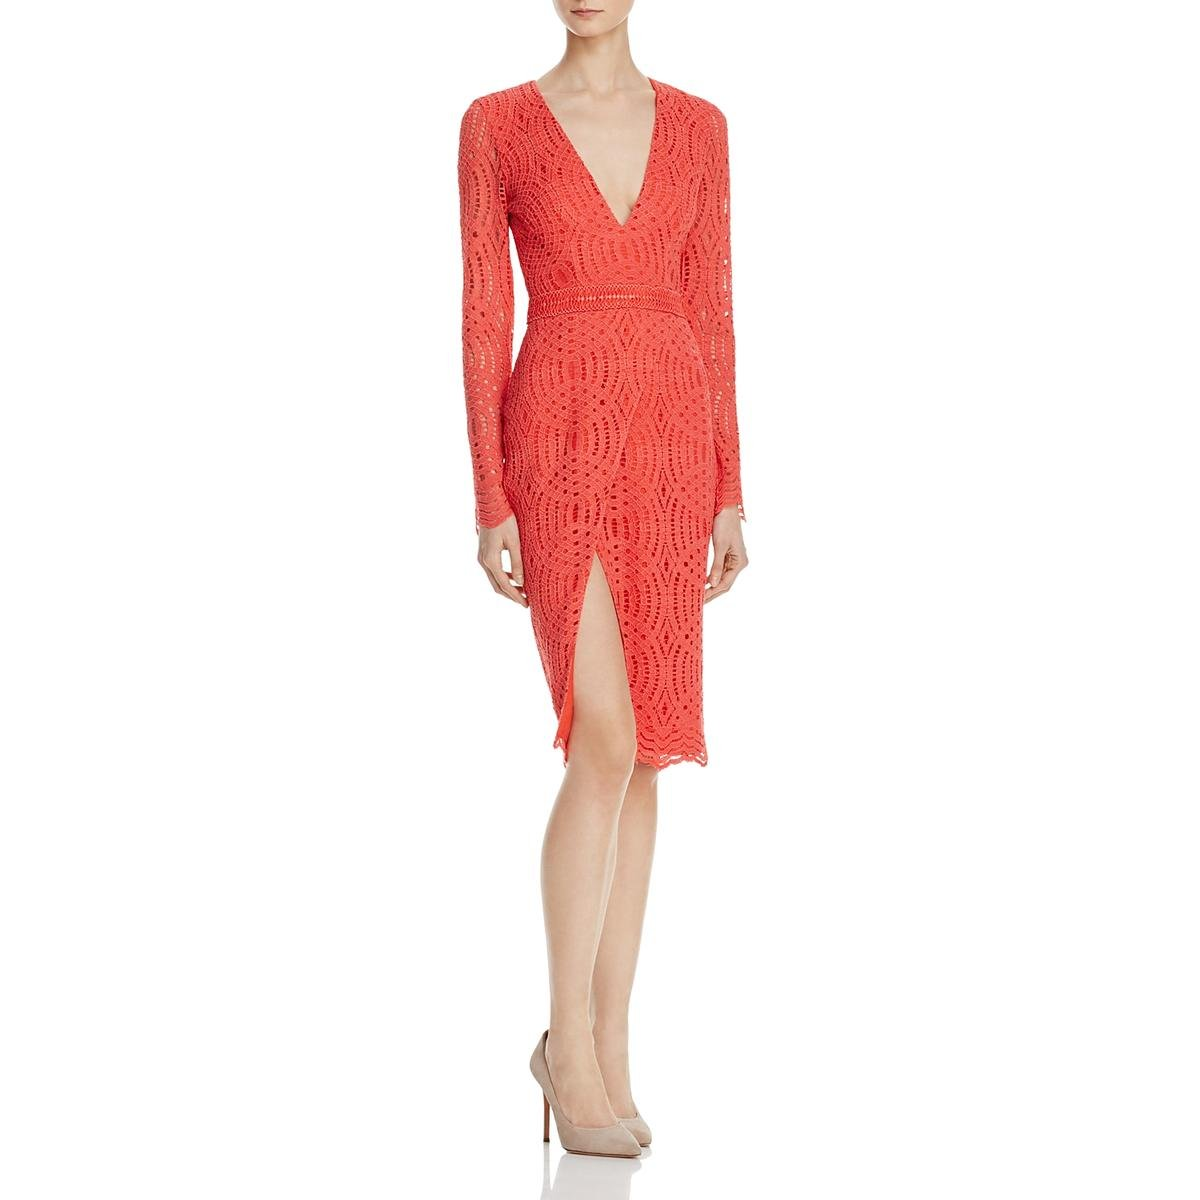 StyleStalker Womens Sabine Lace Sheath Cocktail Dress Orange M